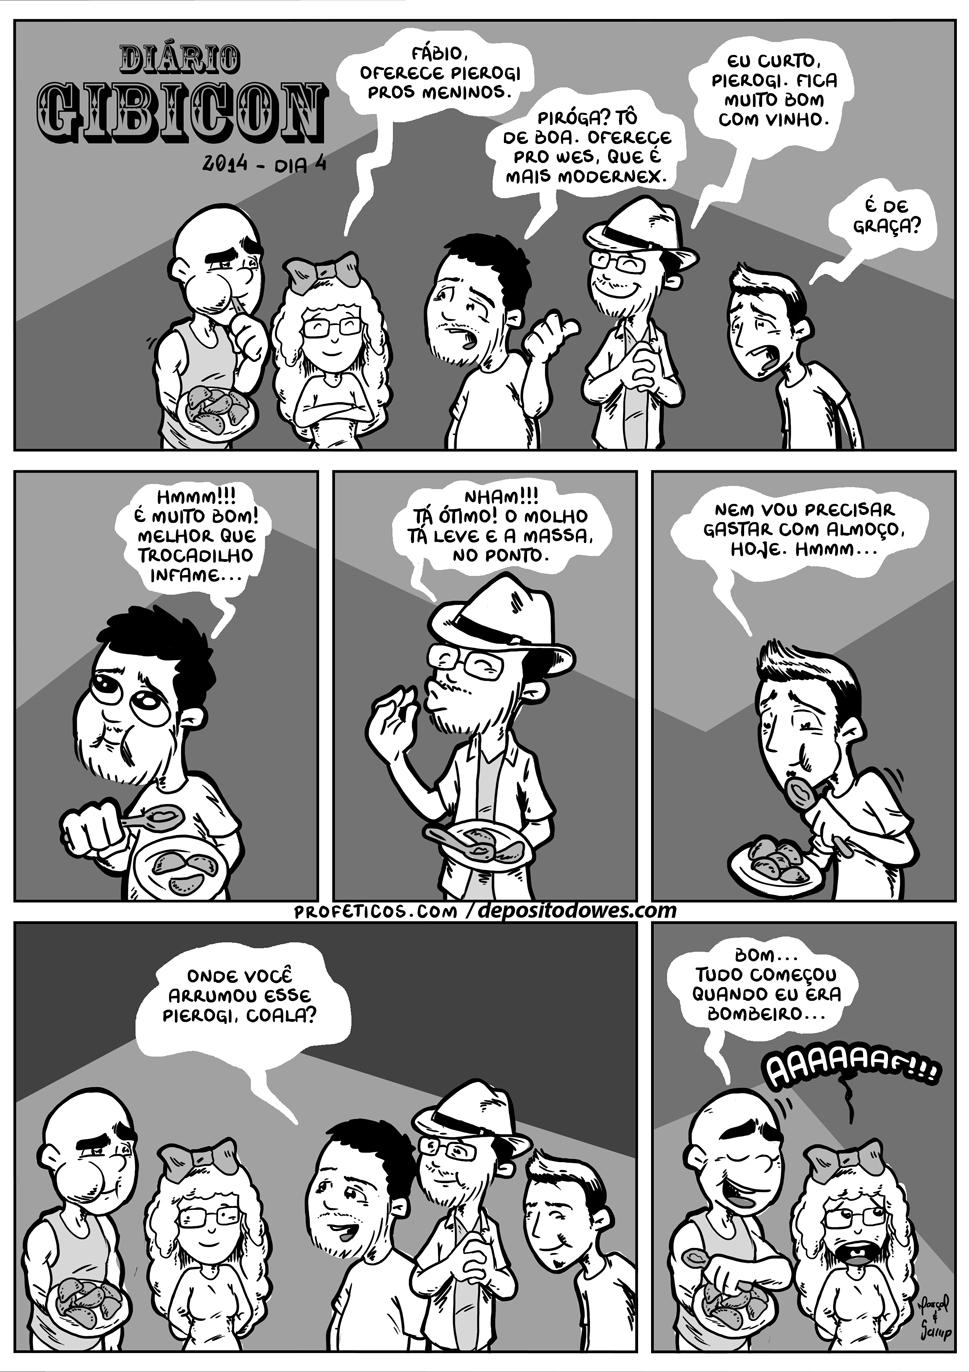 Diário Gibicon 15 | wes samp, webcomics, tirinha, senhora coala, relacionamentos, Rafael Marçal, piroca, pierogi, livro, humor, gourmet, gibicon, fábio coala, evento, digo freitas, diário gibicon, comida, avareza